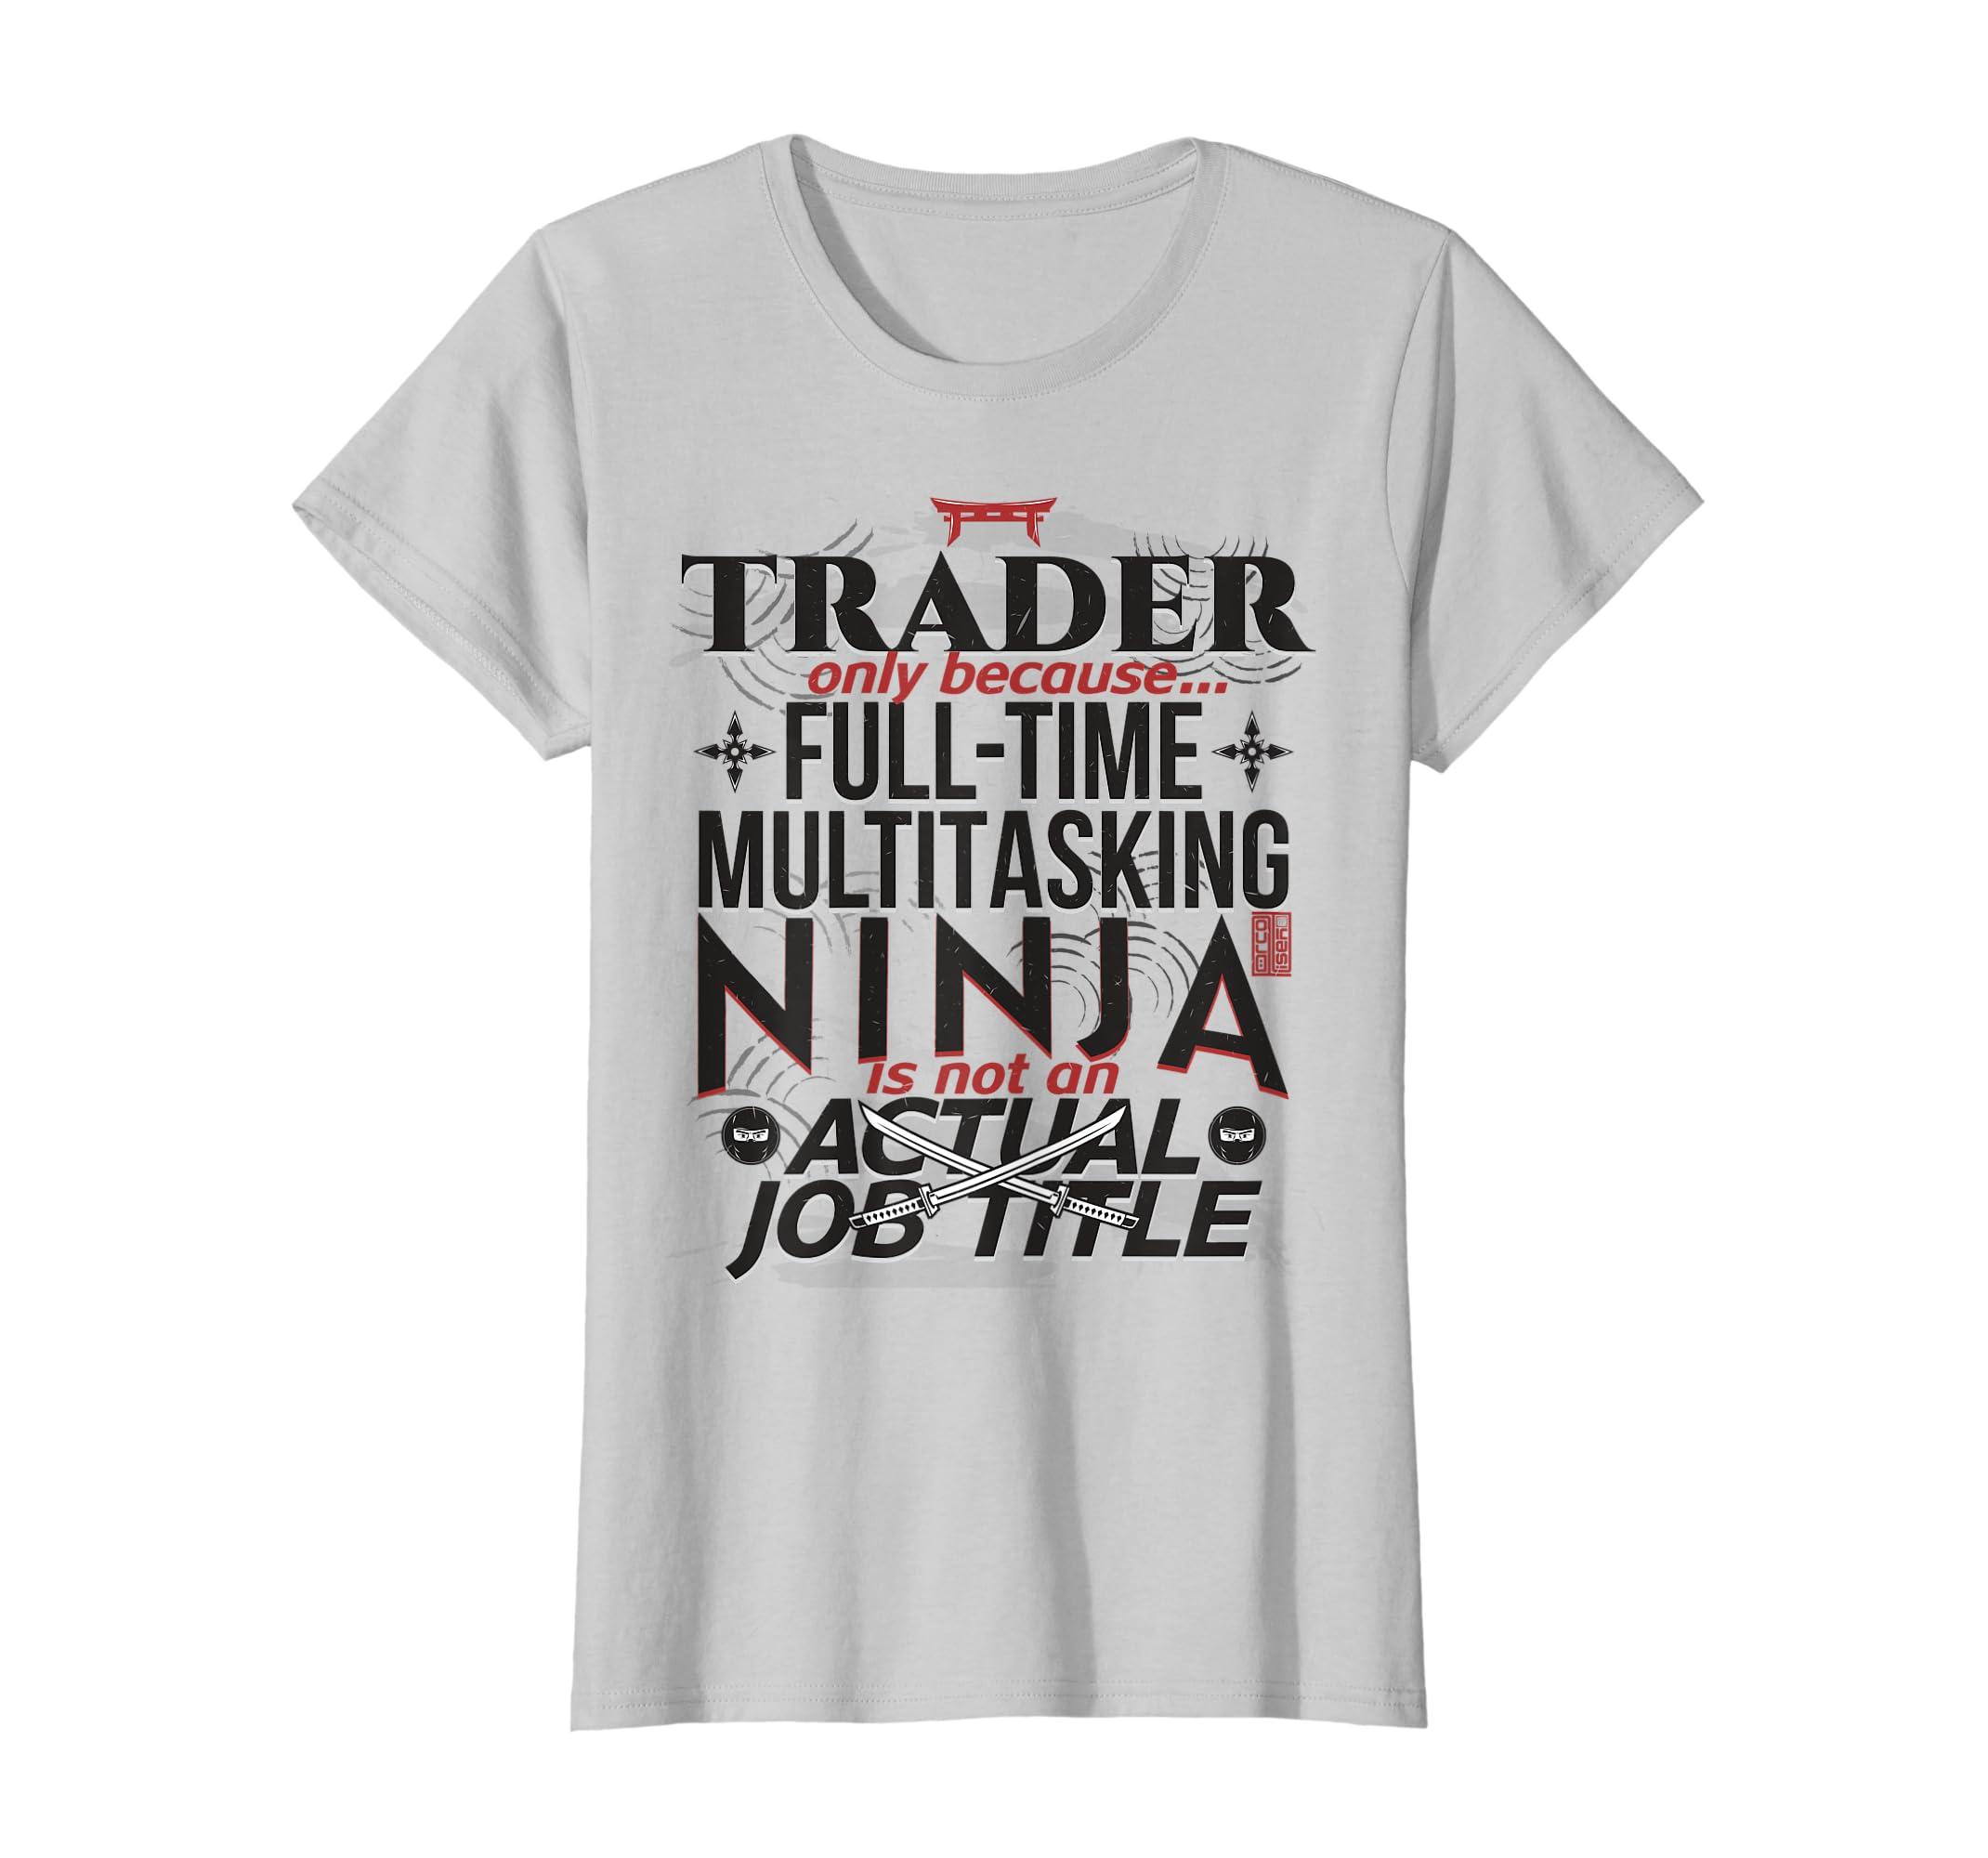 Amazon.com: TRADER FULL-TIME MULTITASK NINJA JOB TITLE T ...